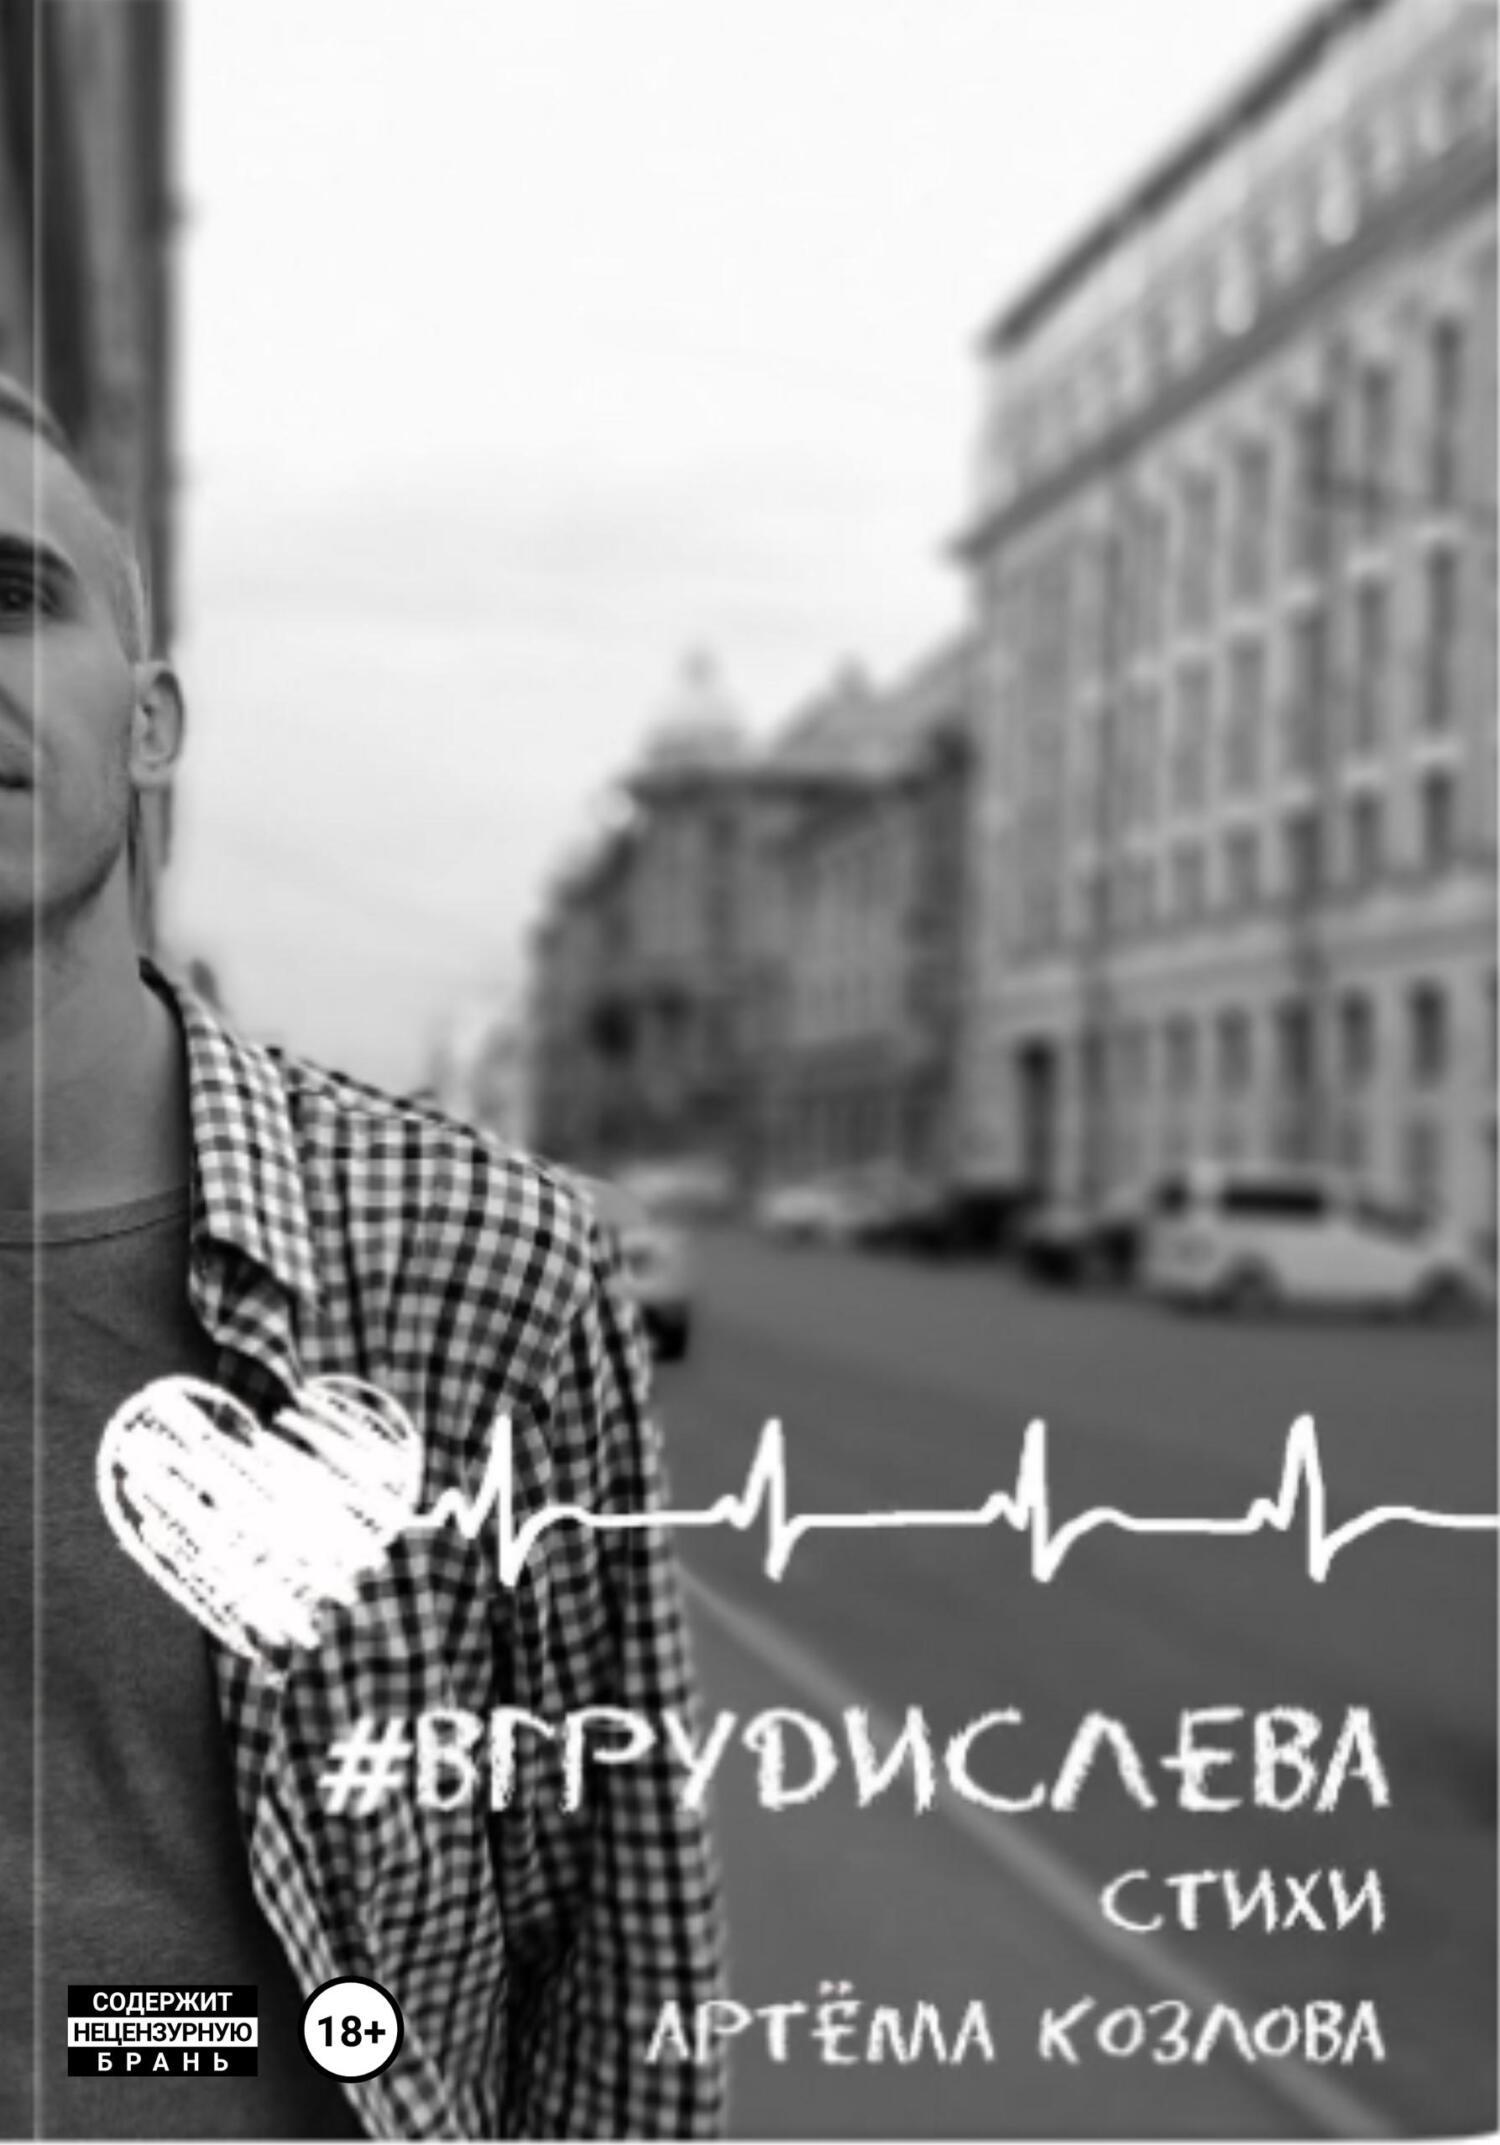 Артем Викторович Козлов #вгрудислева